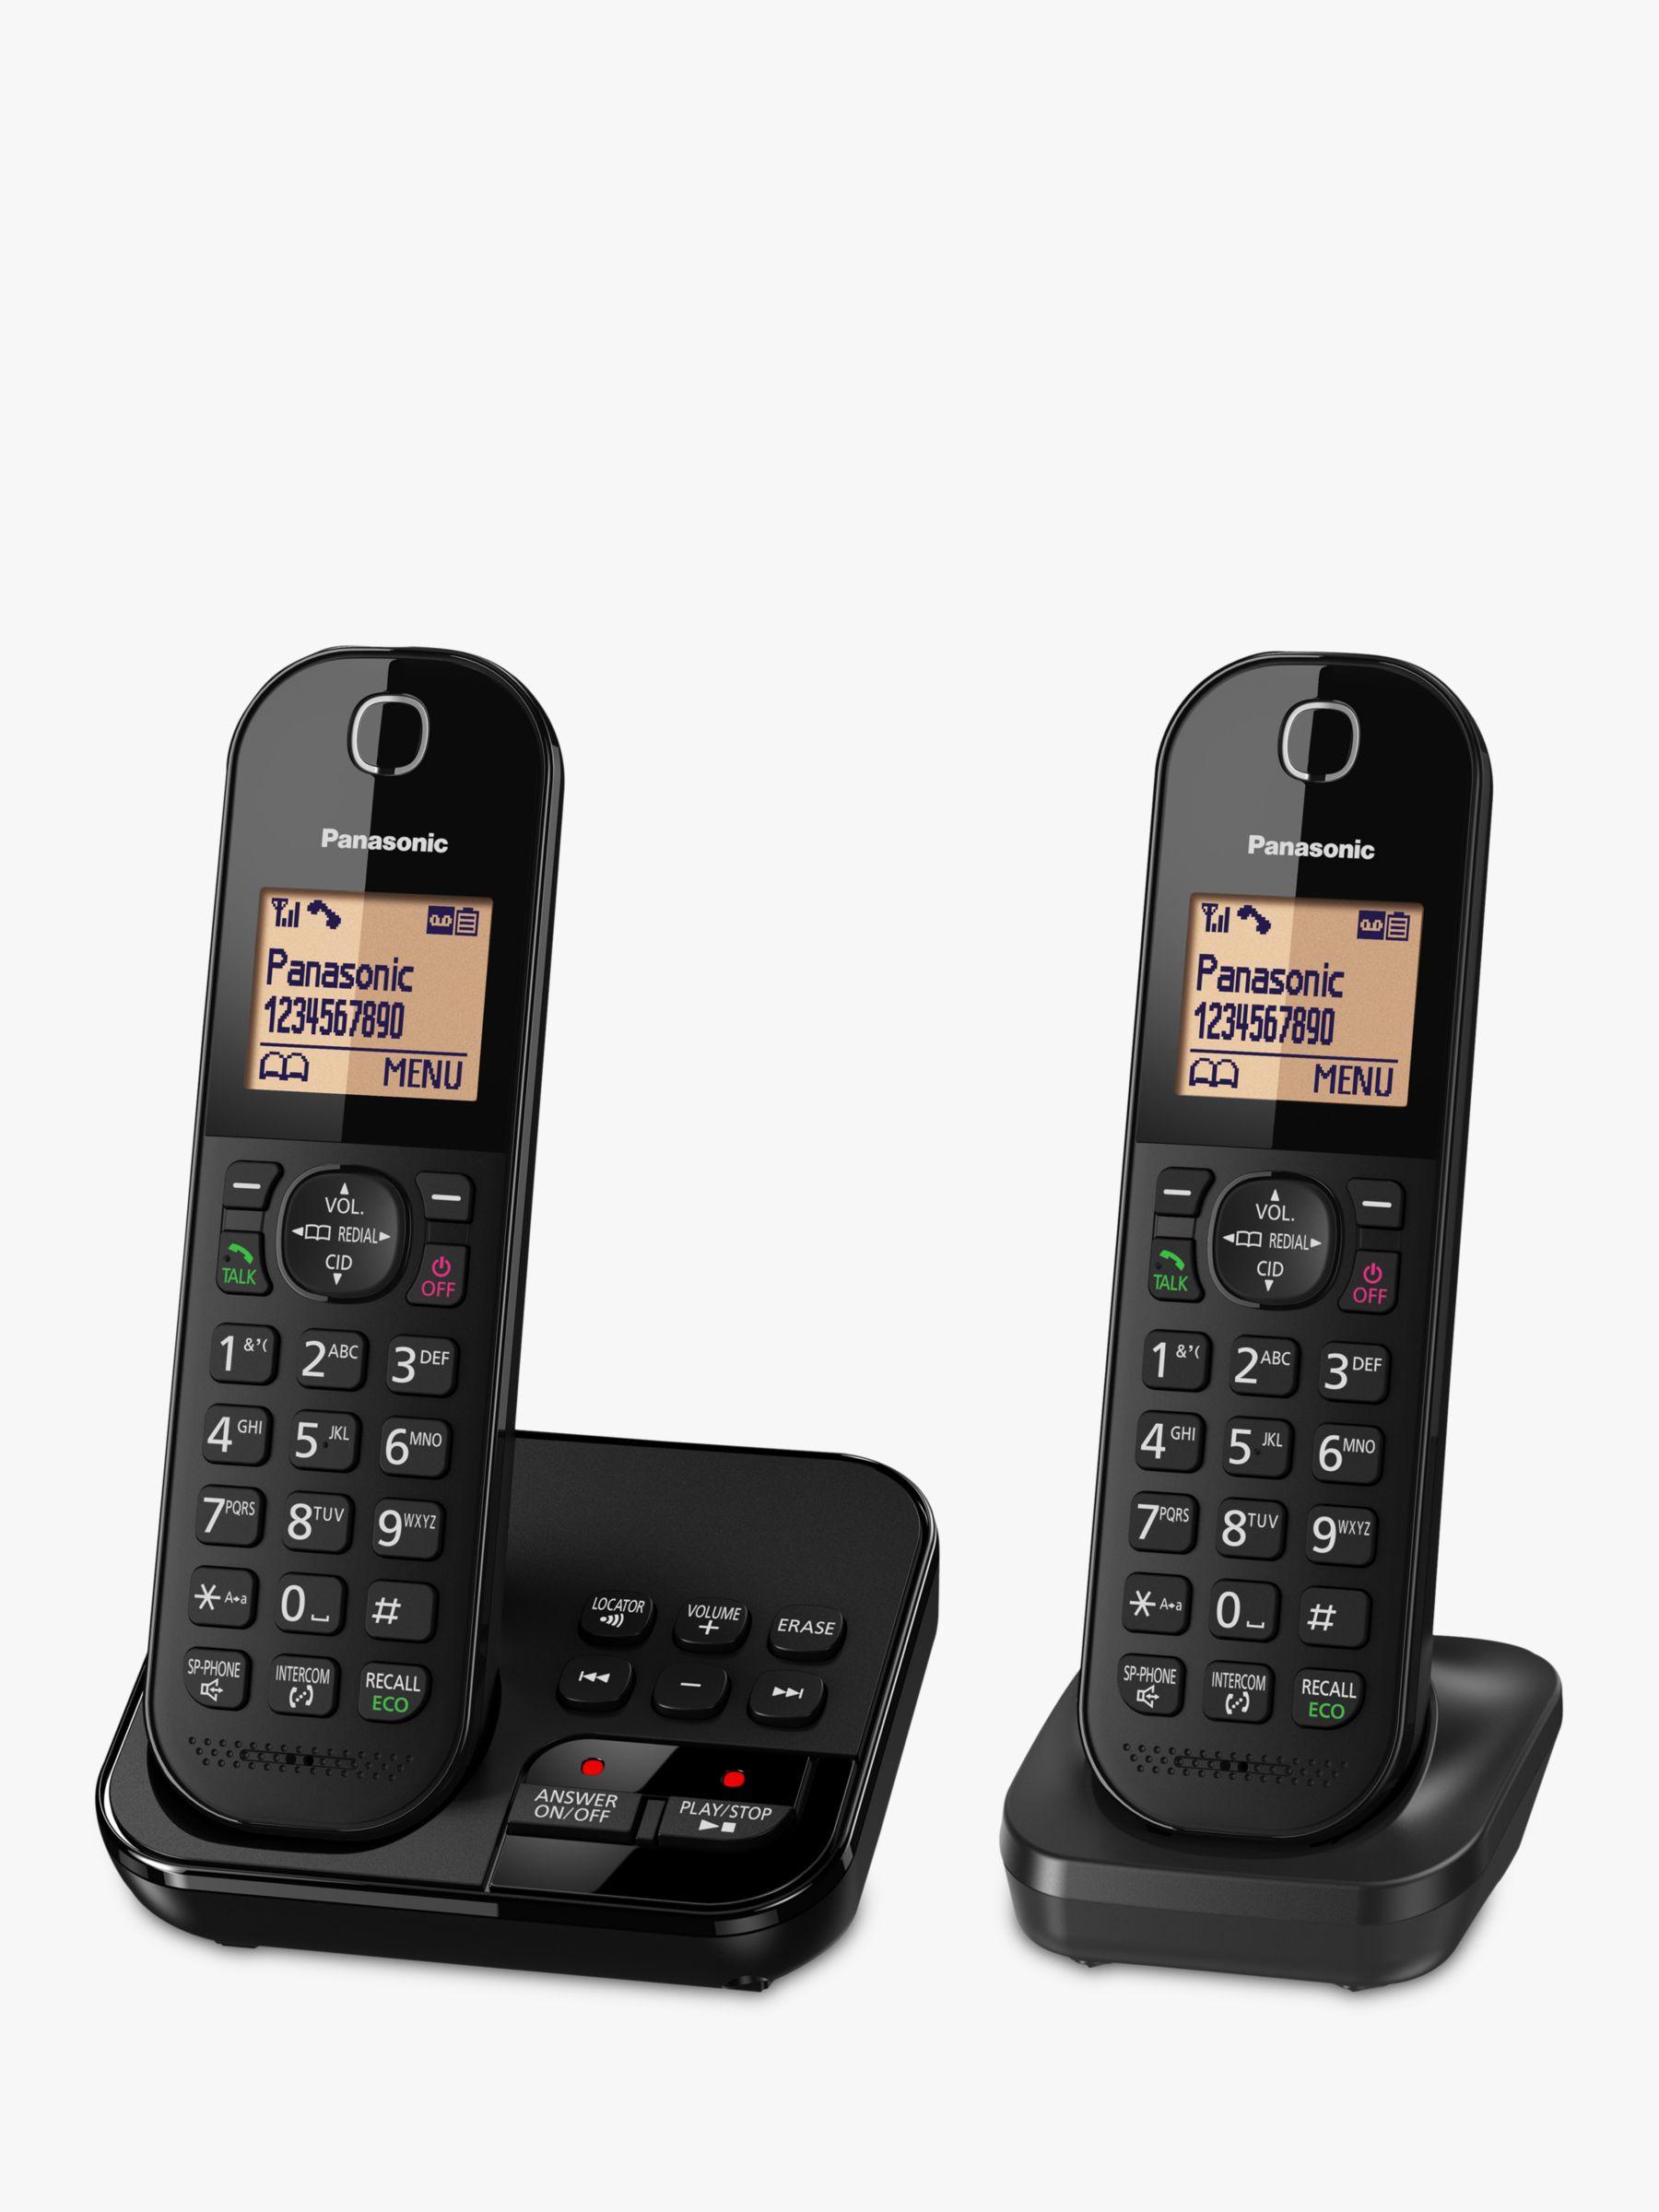 Panasonic Kx Tgc422eb Digital Cordless Telephone With 1 6 Backlit Lcd Screen Nuisance Call Blocker Answering Machine Twin Dect